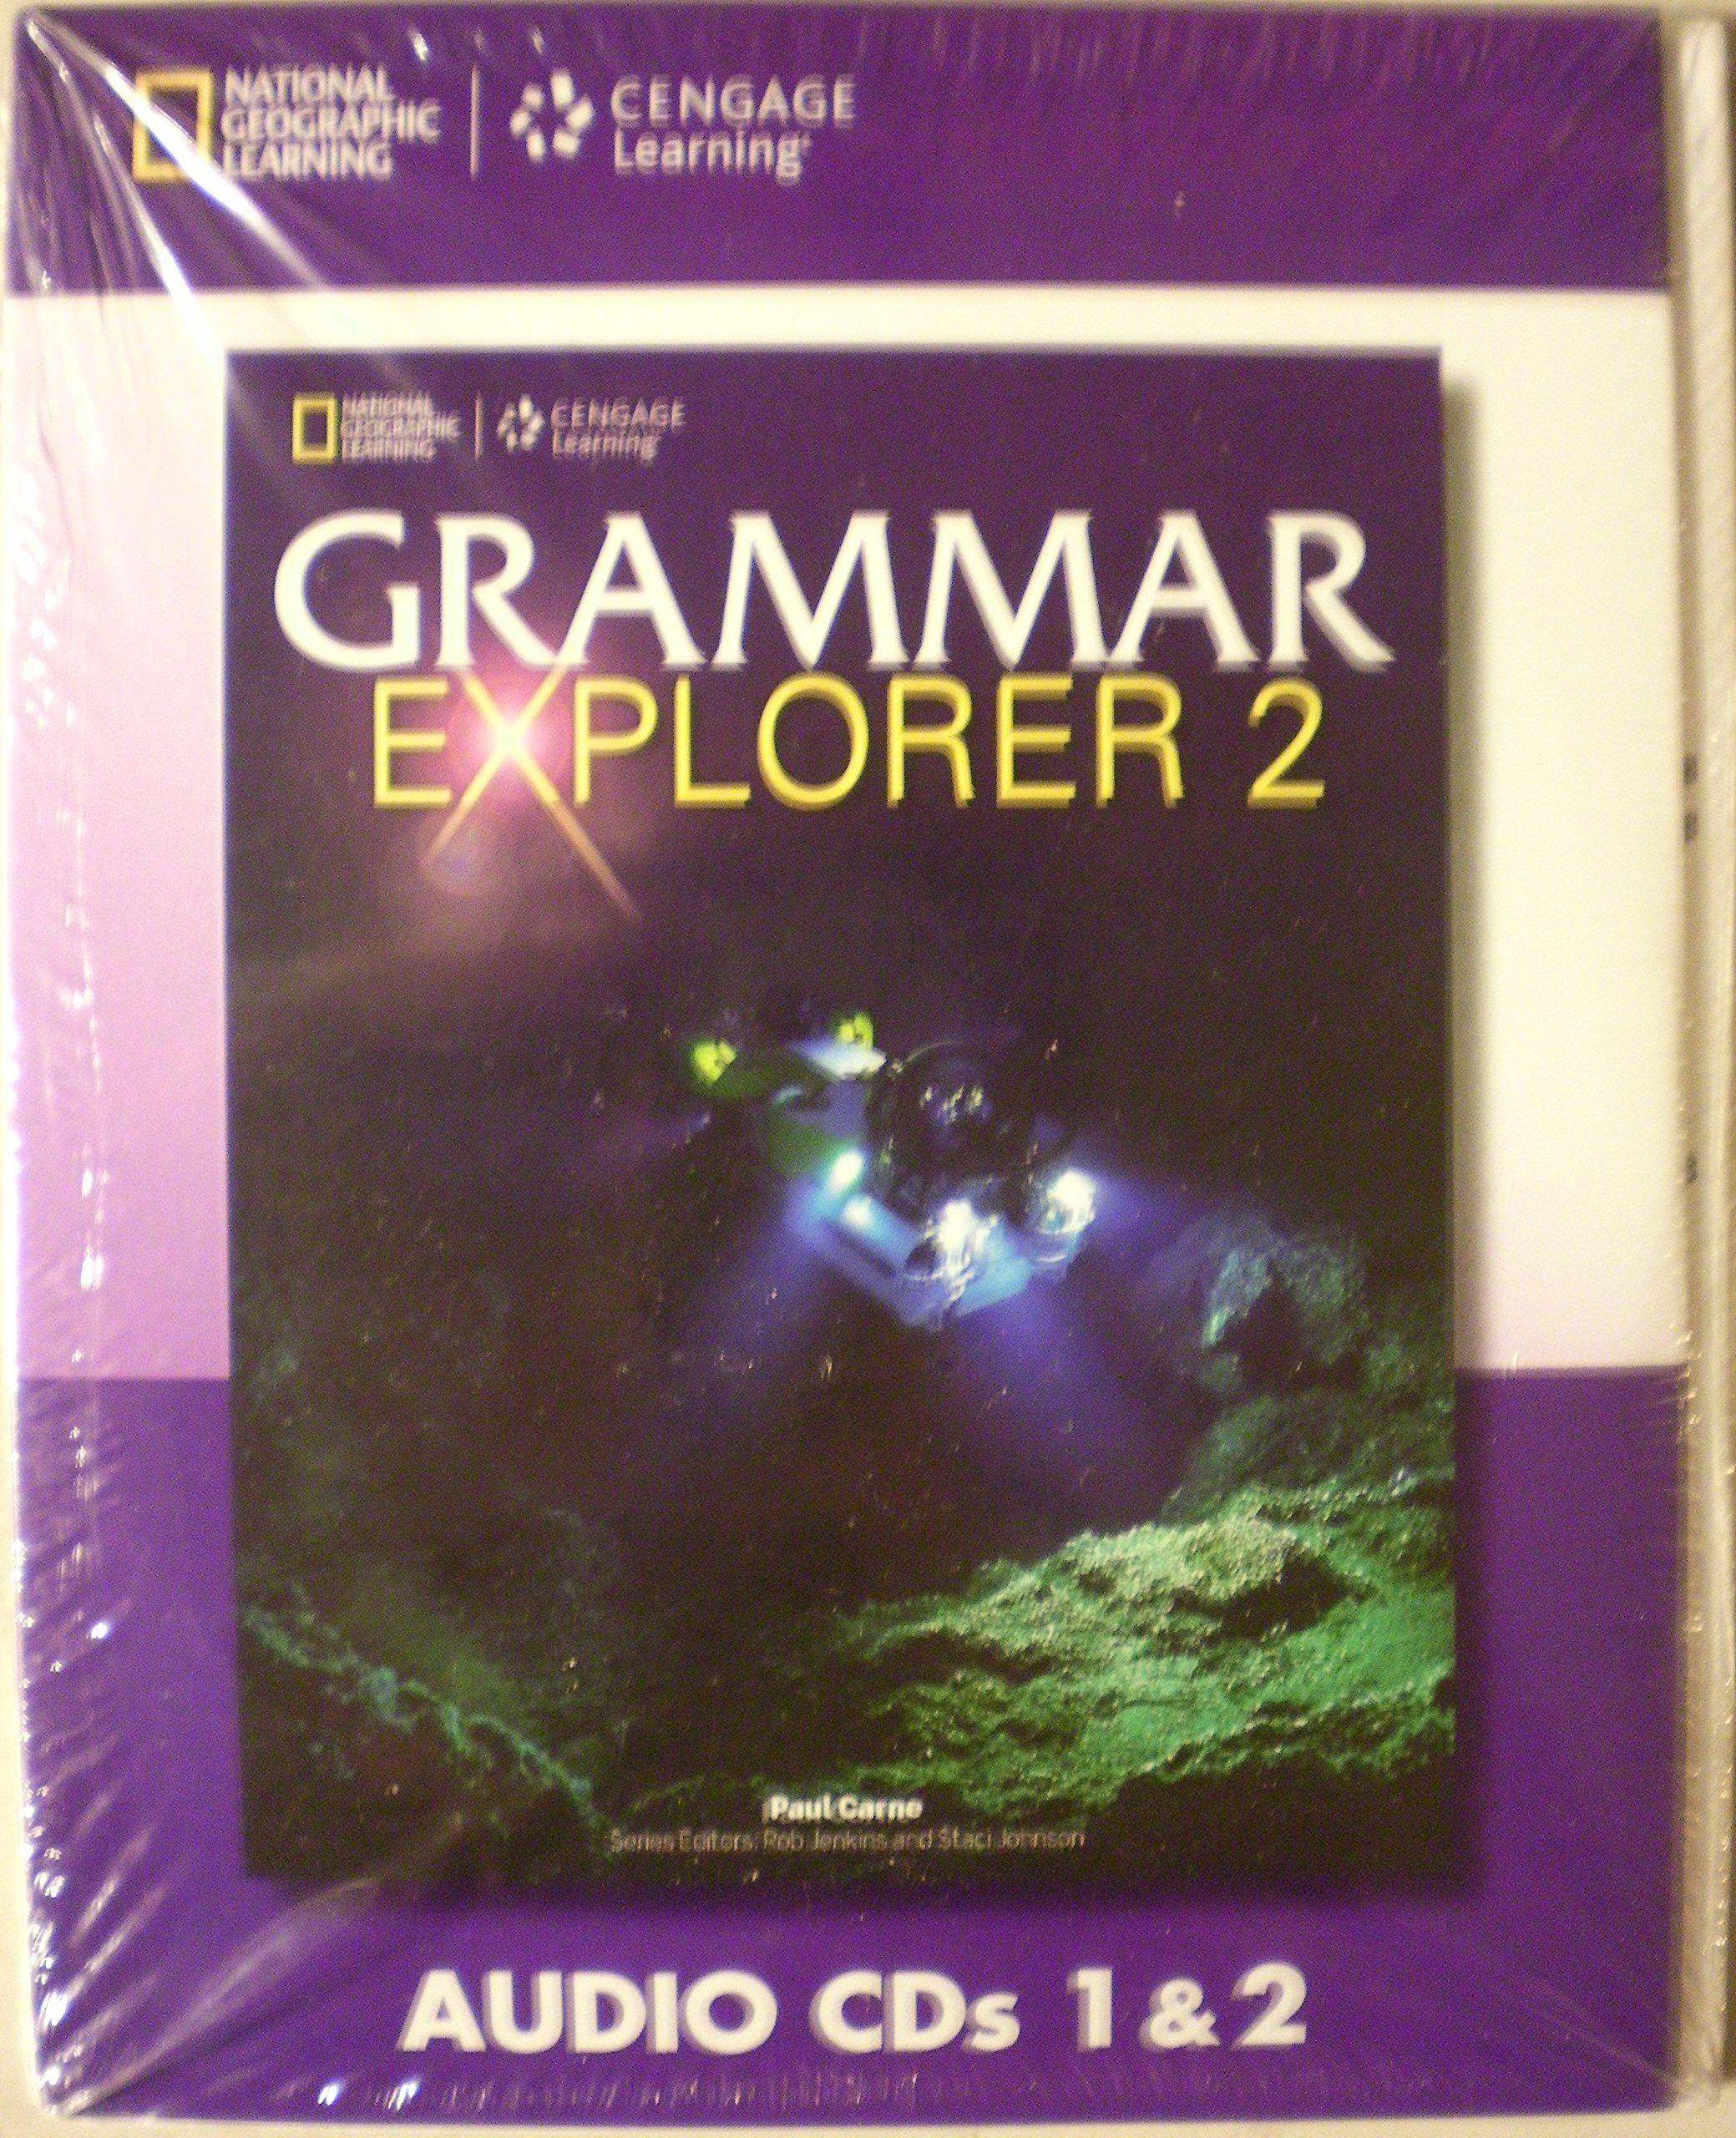 Grammar Explorer 2 (2 Audio CD) by Cengage Learning Australia